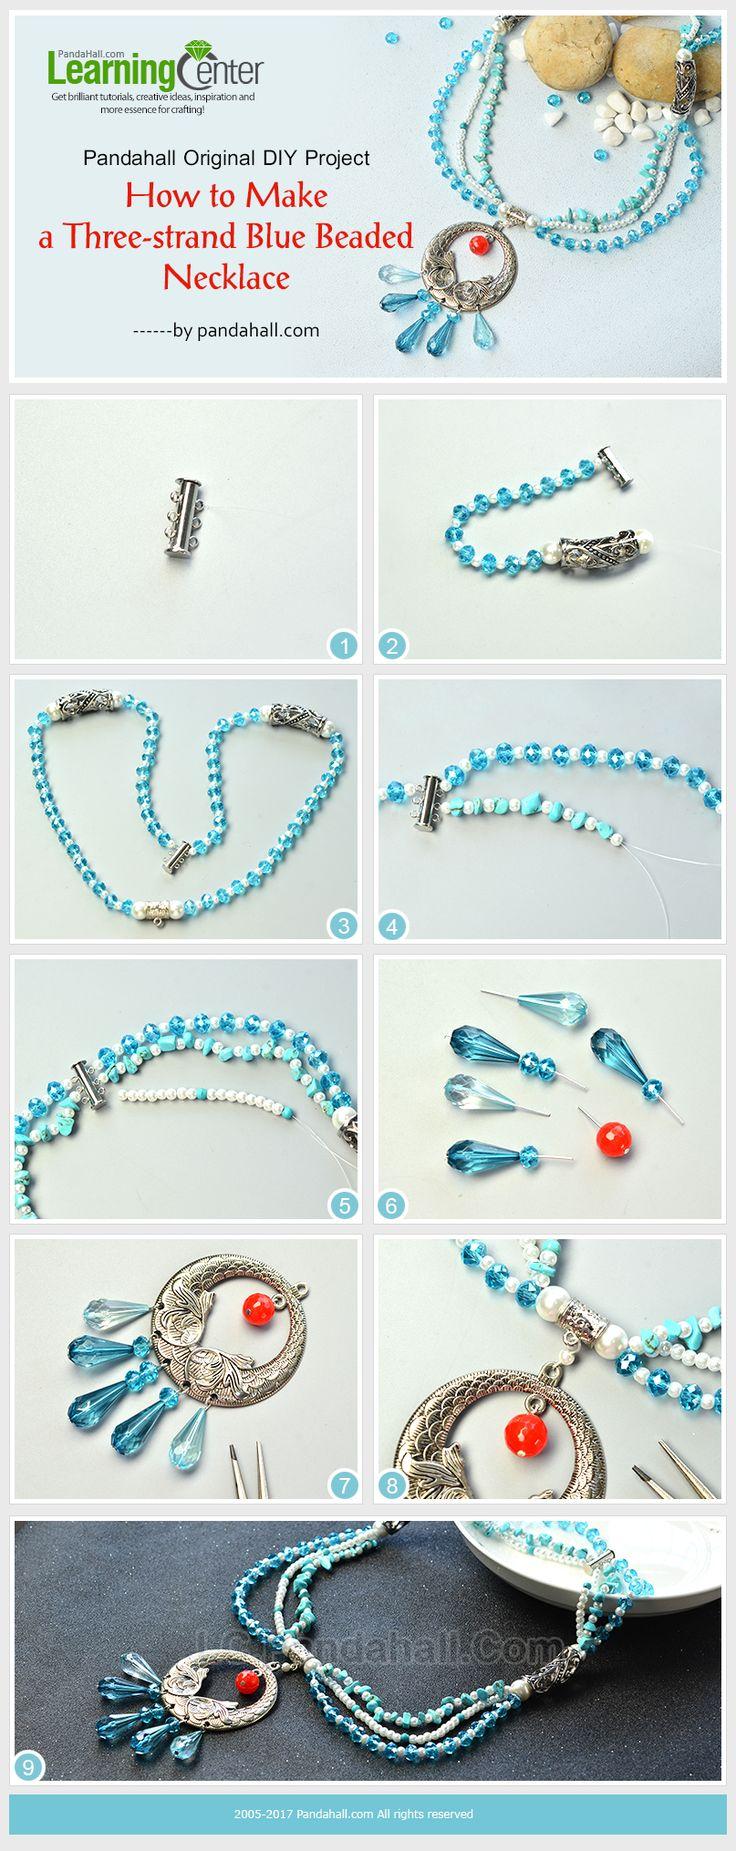 Pandahall Original DIY Project - How to Make a Three-strand Blue Beaded Necklace